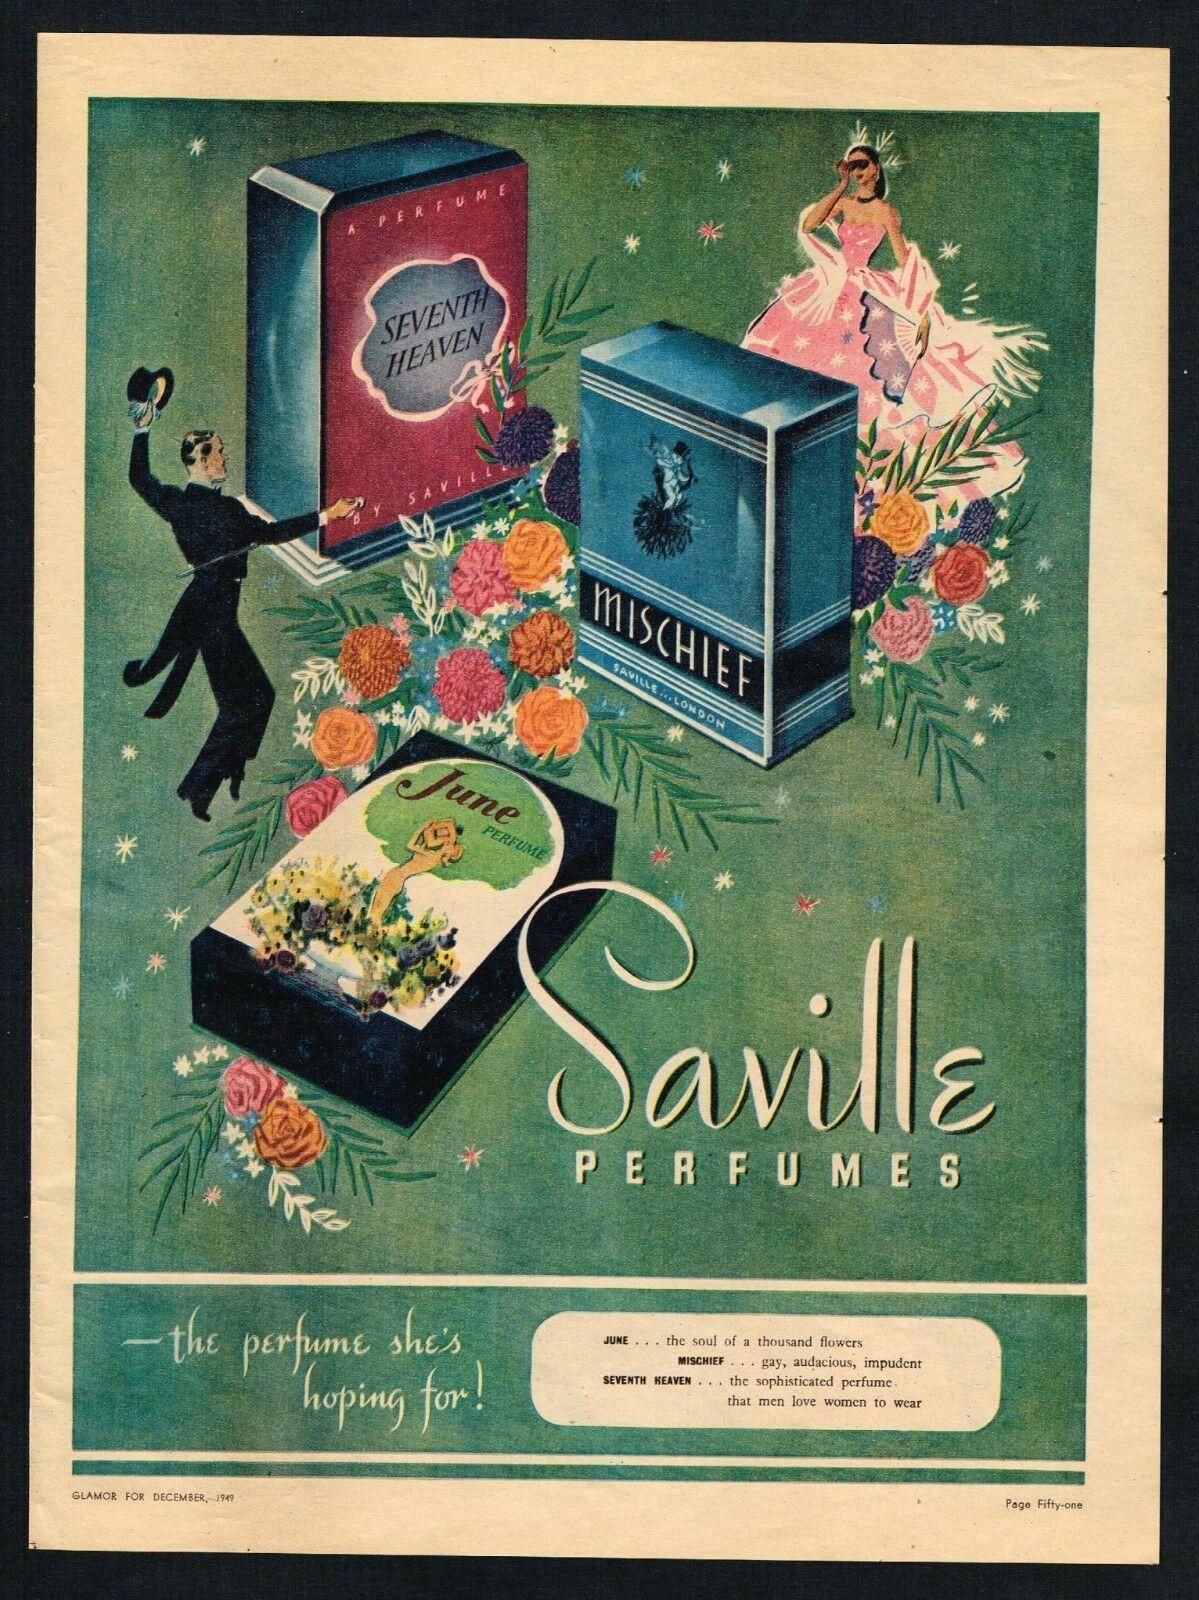 SAVILLES PERFUMES AD PERFUME ADVERTISING Original 1949